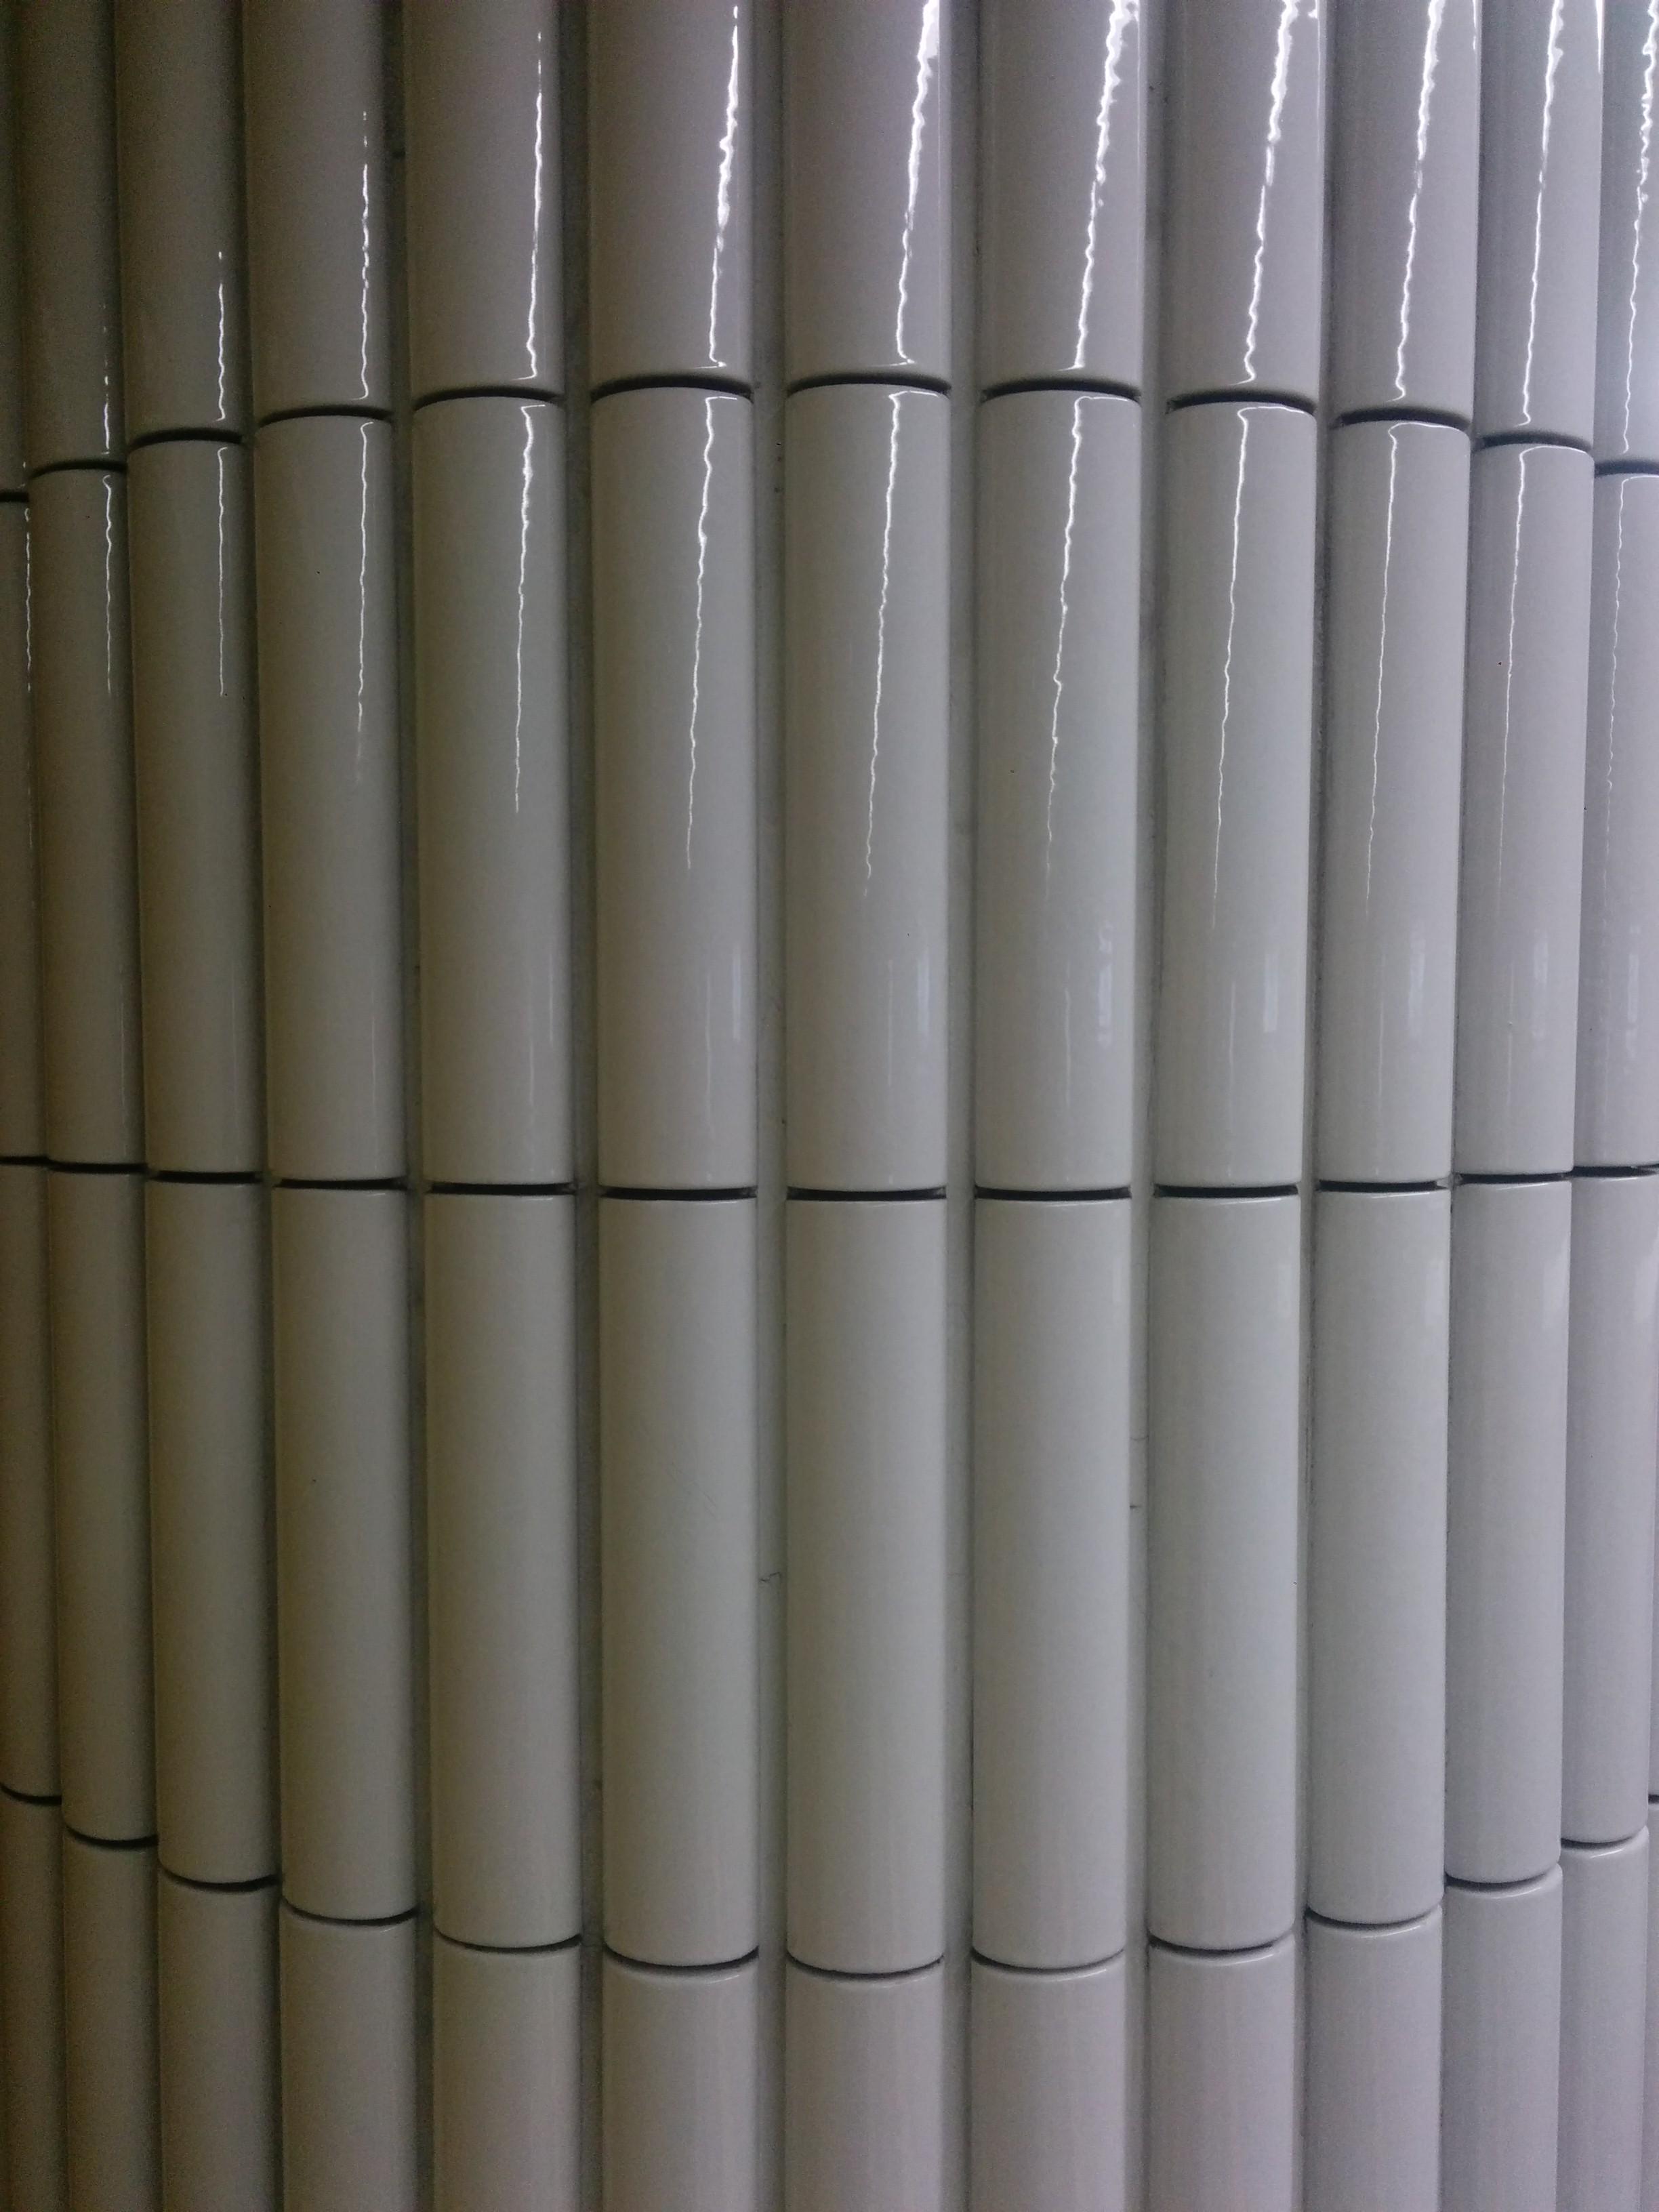 File:Azabujuban station Oedo platform pillar tiles.jpg - Wikimedia ... for Pillar Tiles Images  103wja